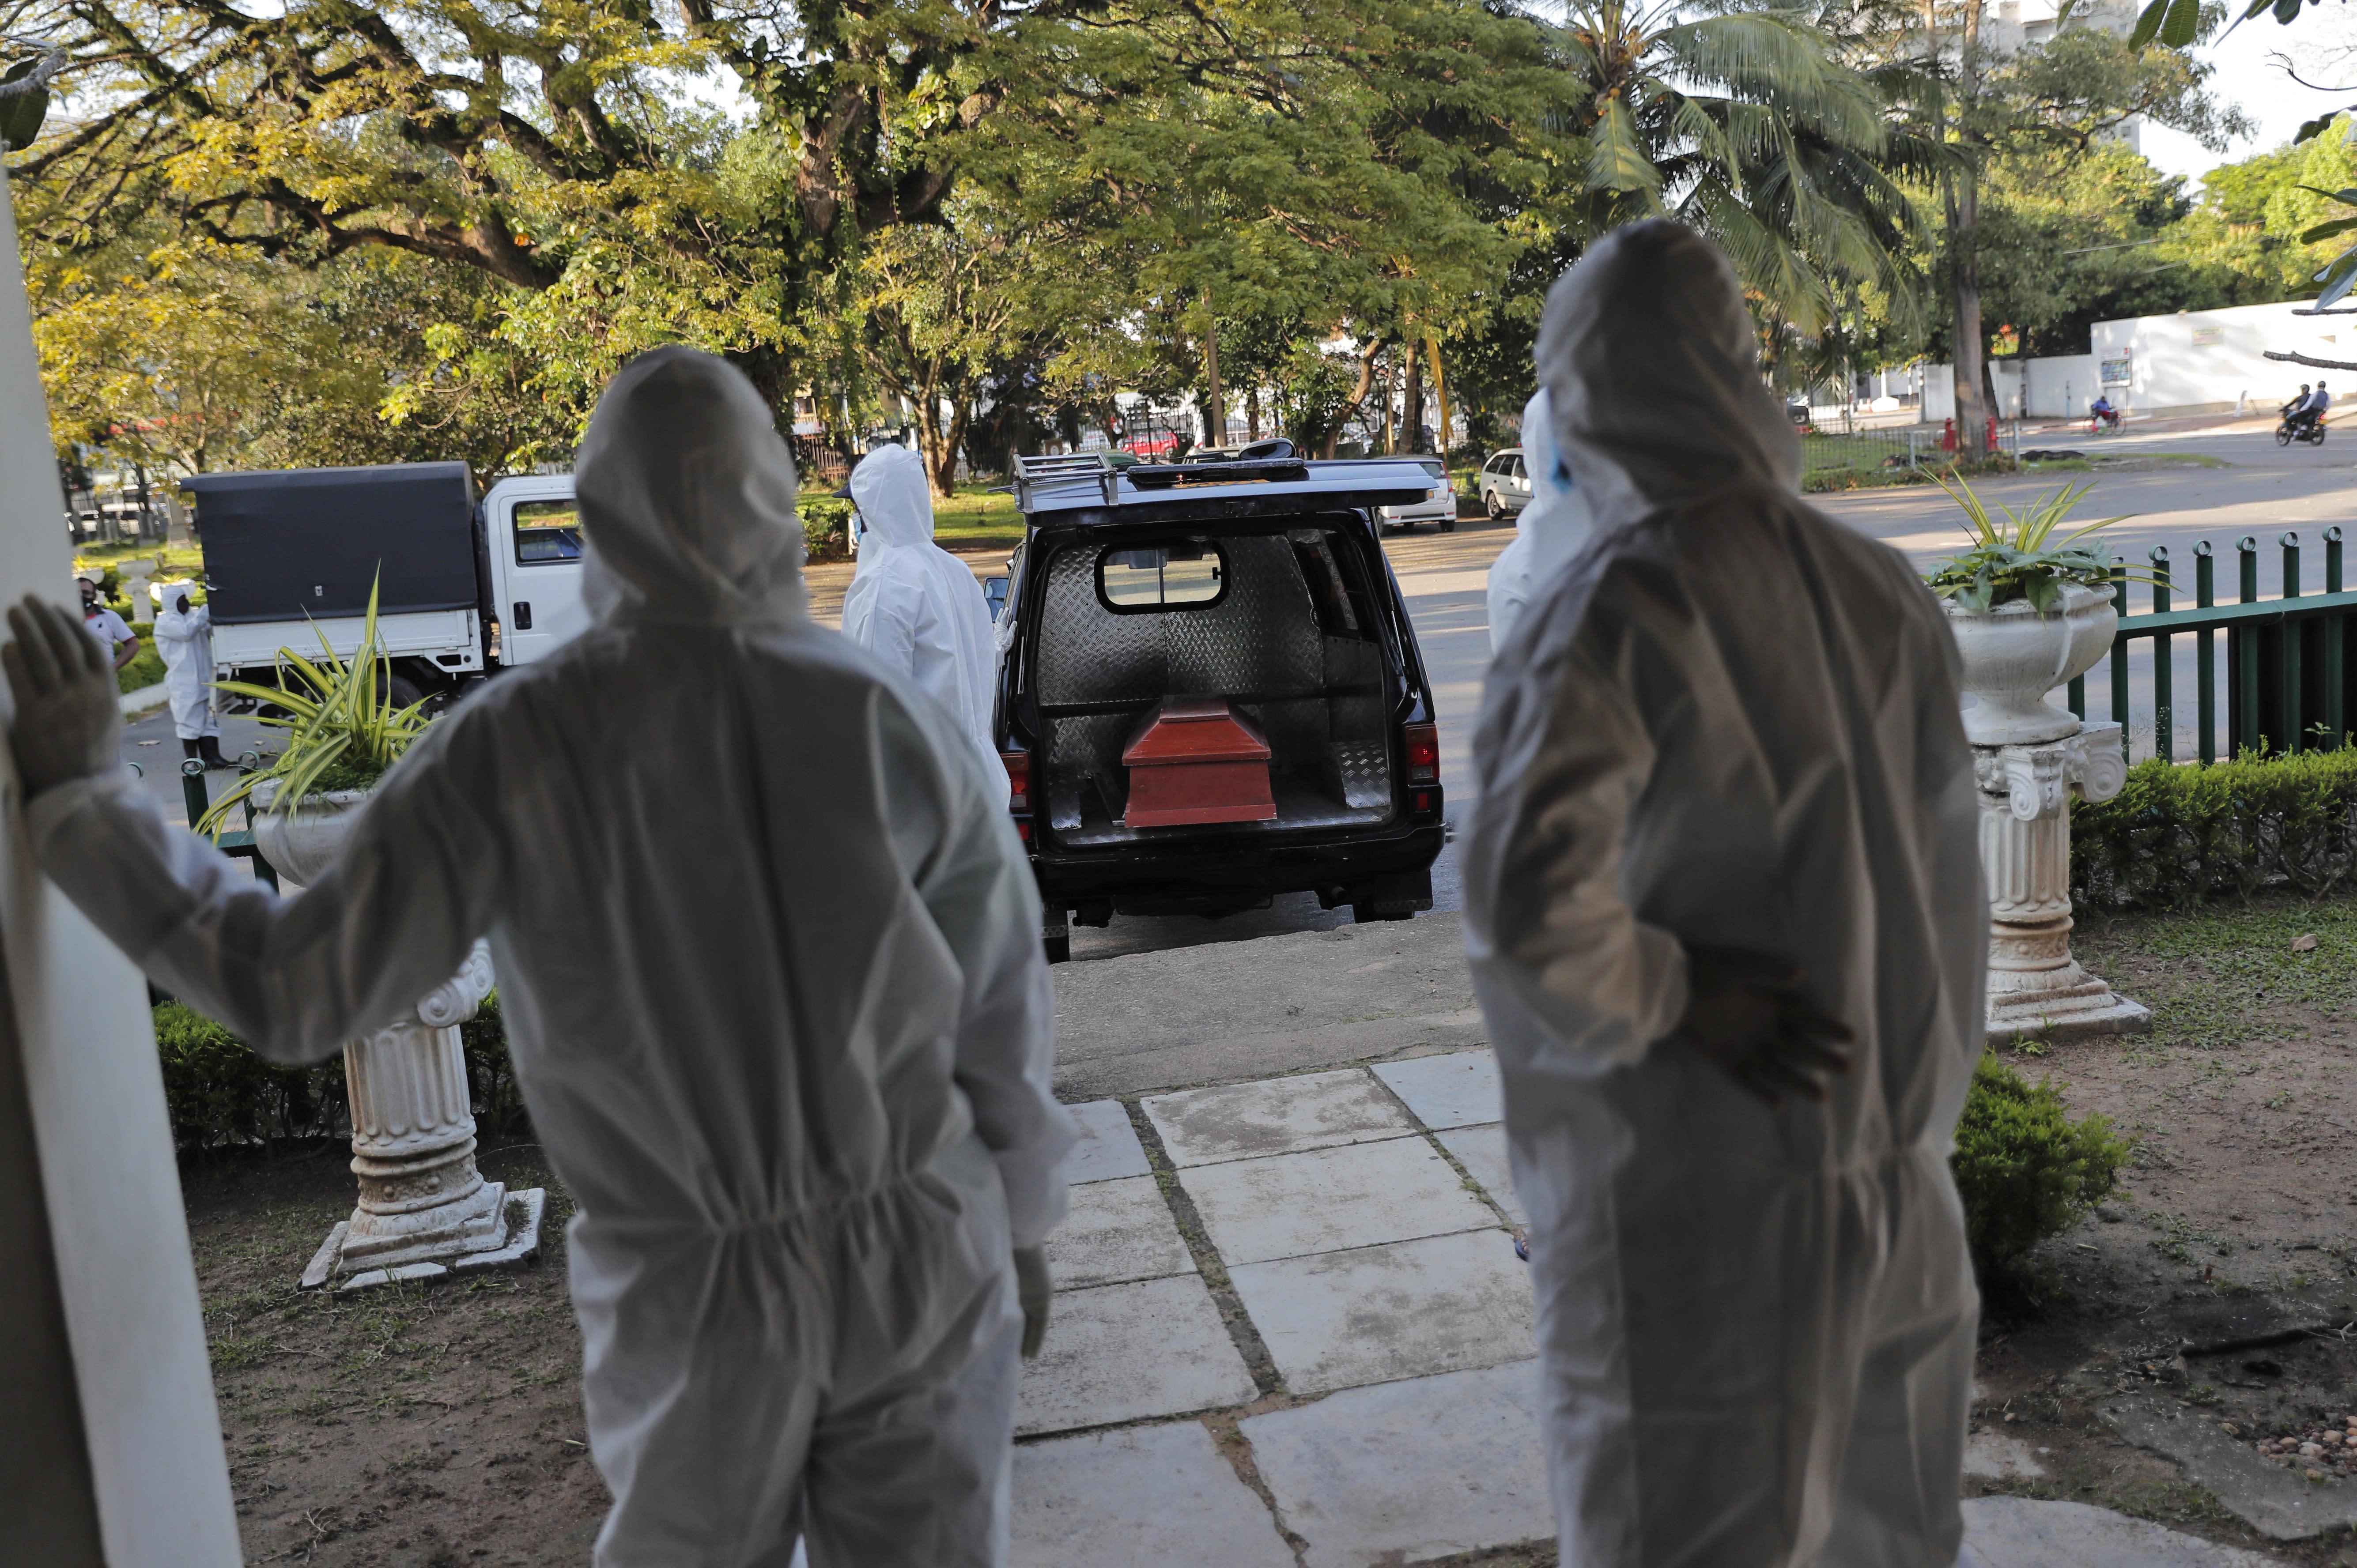 UN group says Sri Lanka virus cremation rule violates rights